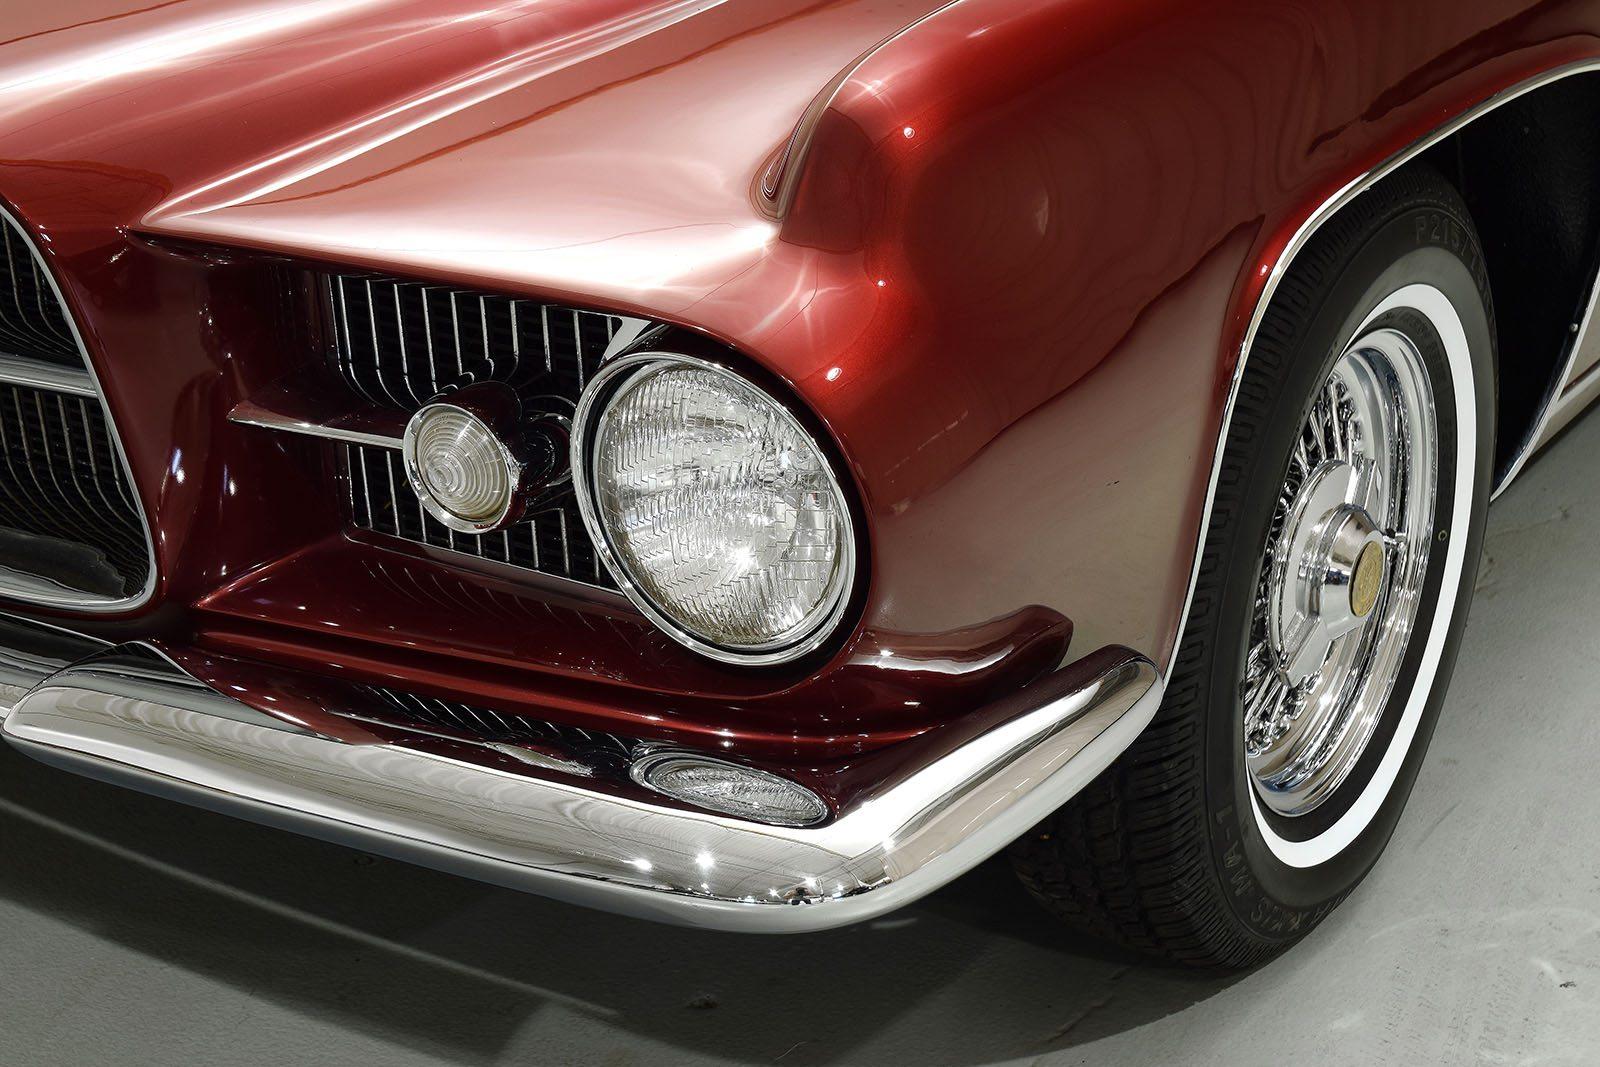 1963 Ghia L6.4 Coupe headlight close up